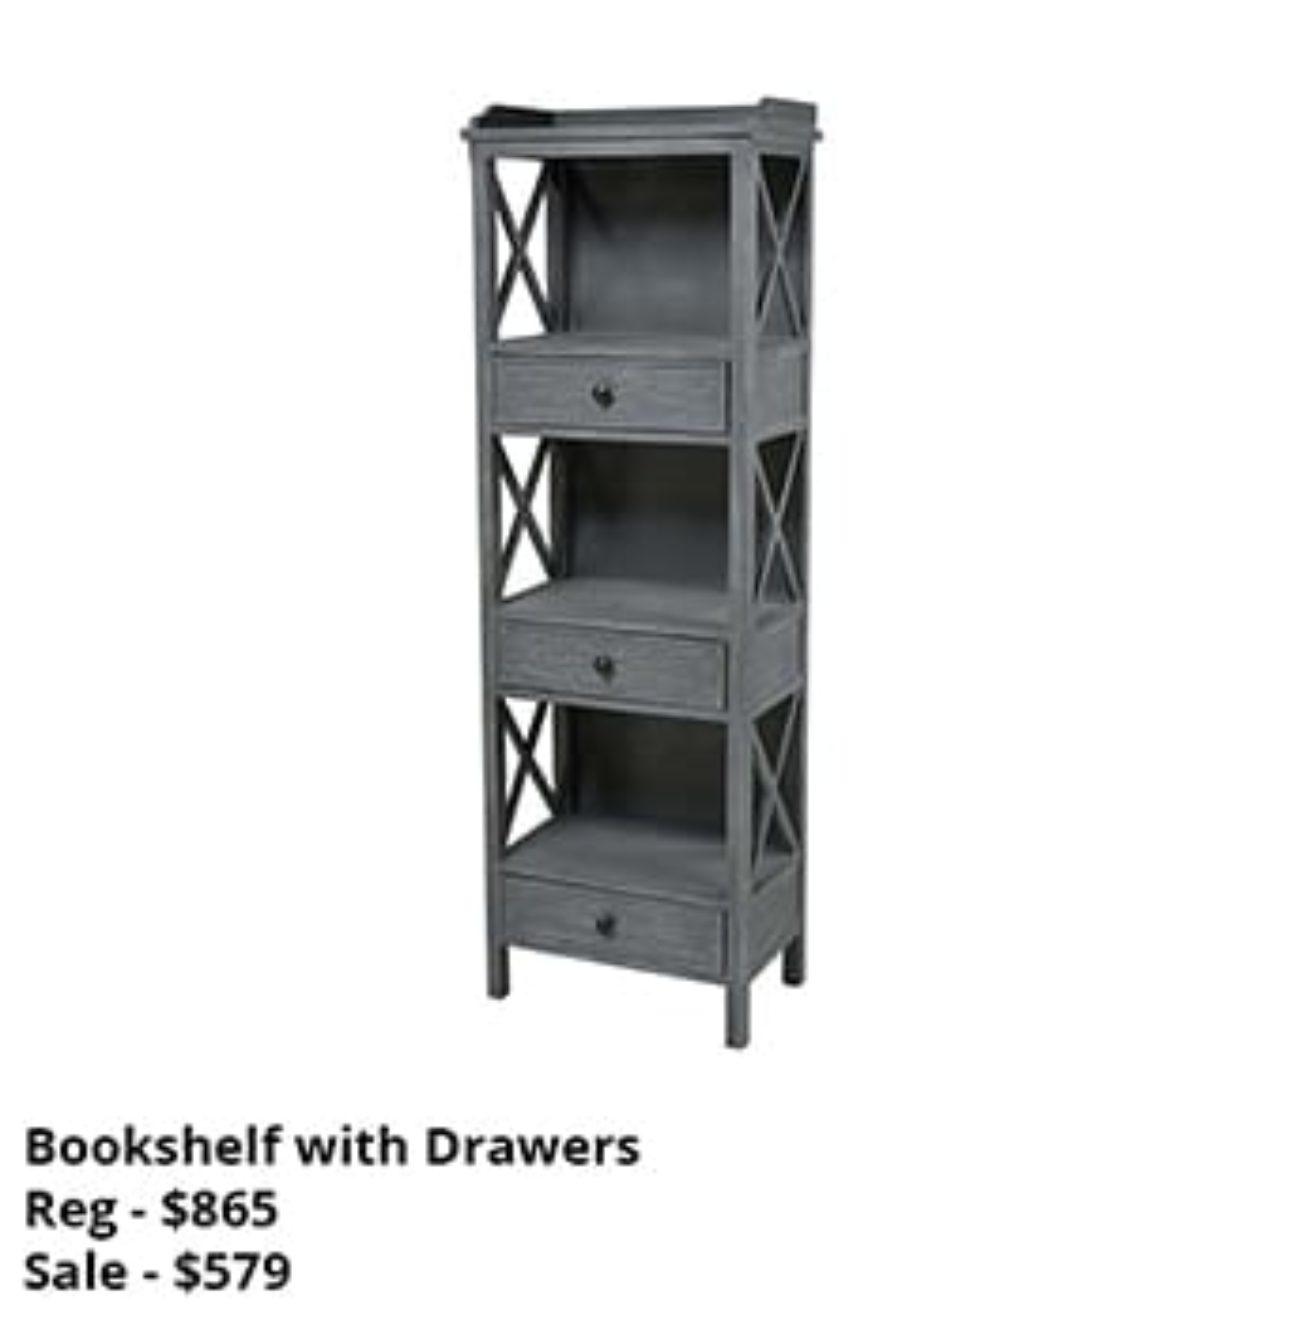 Gray Bookshelf with Drawers